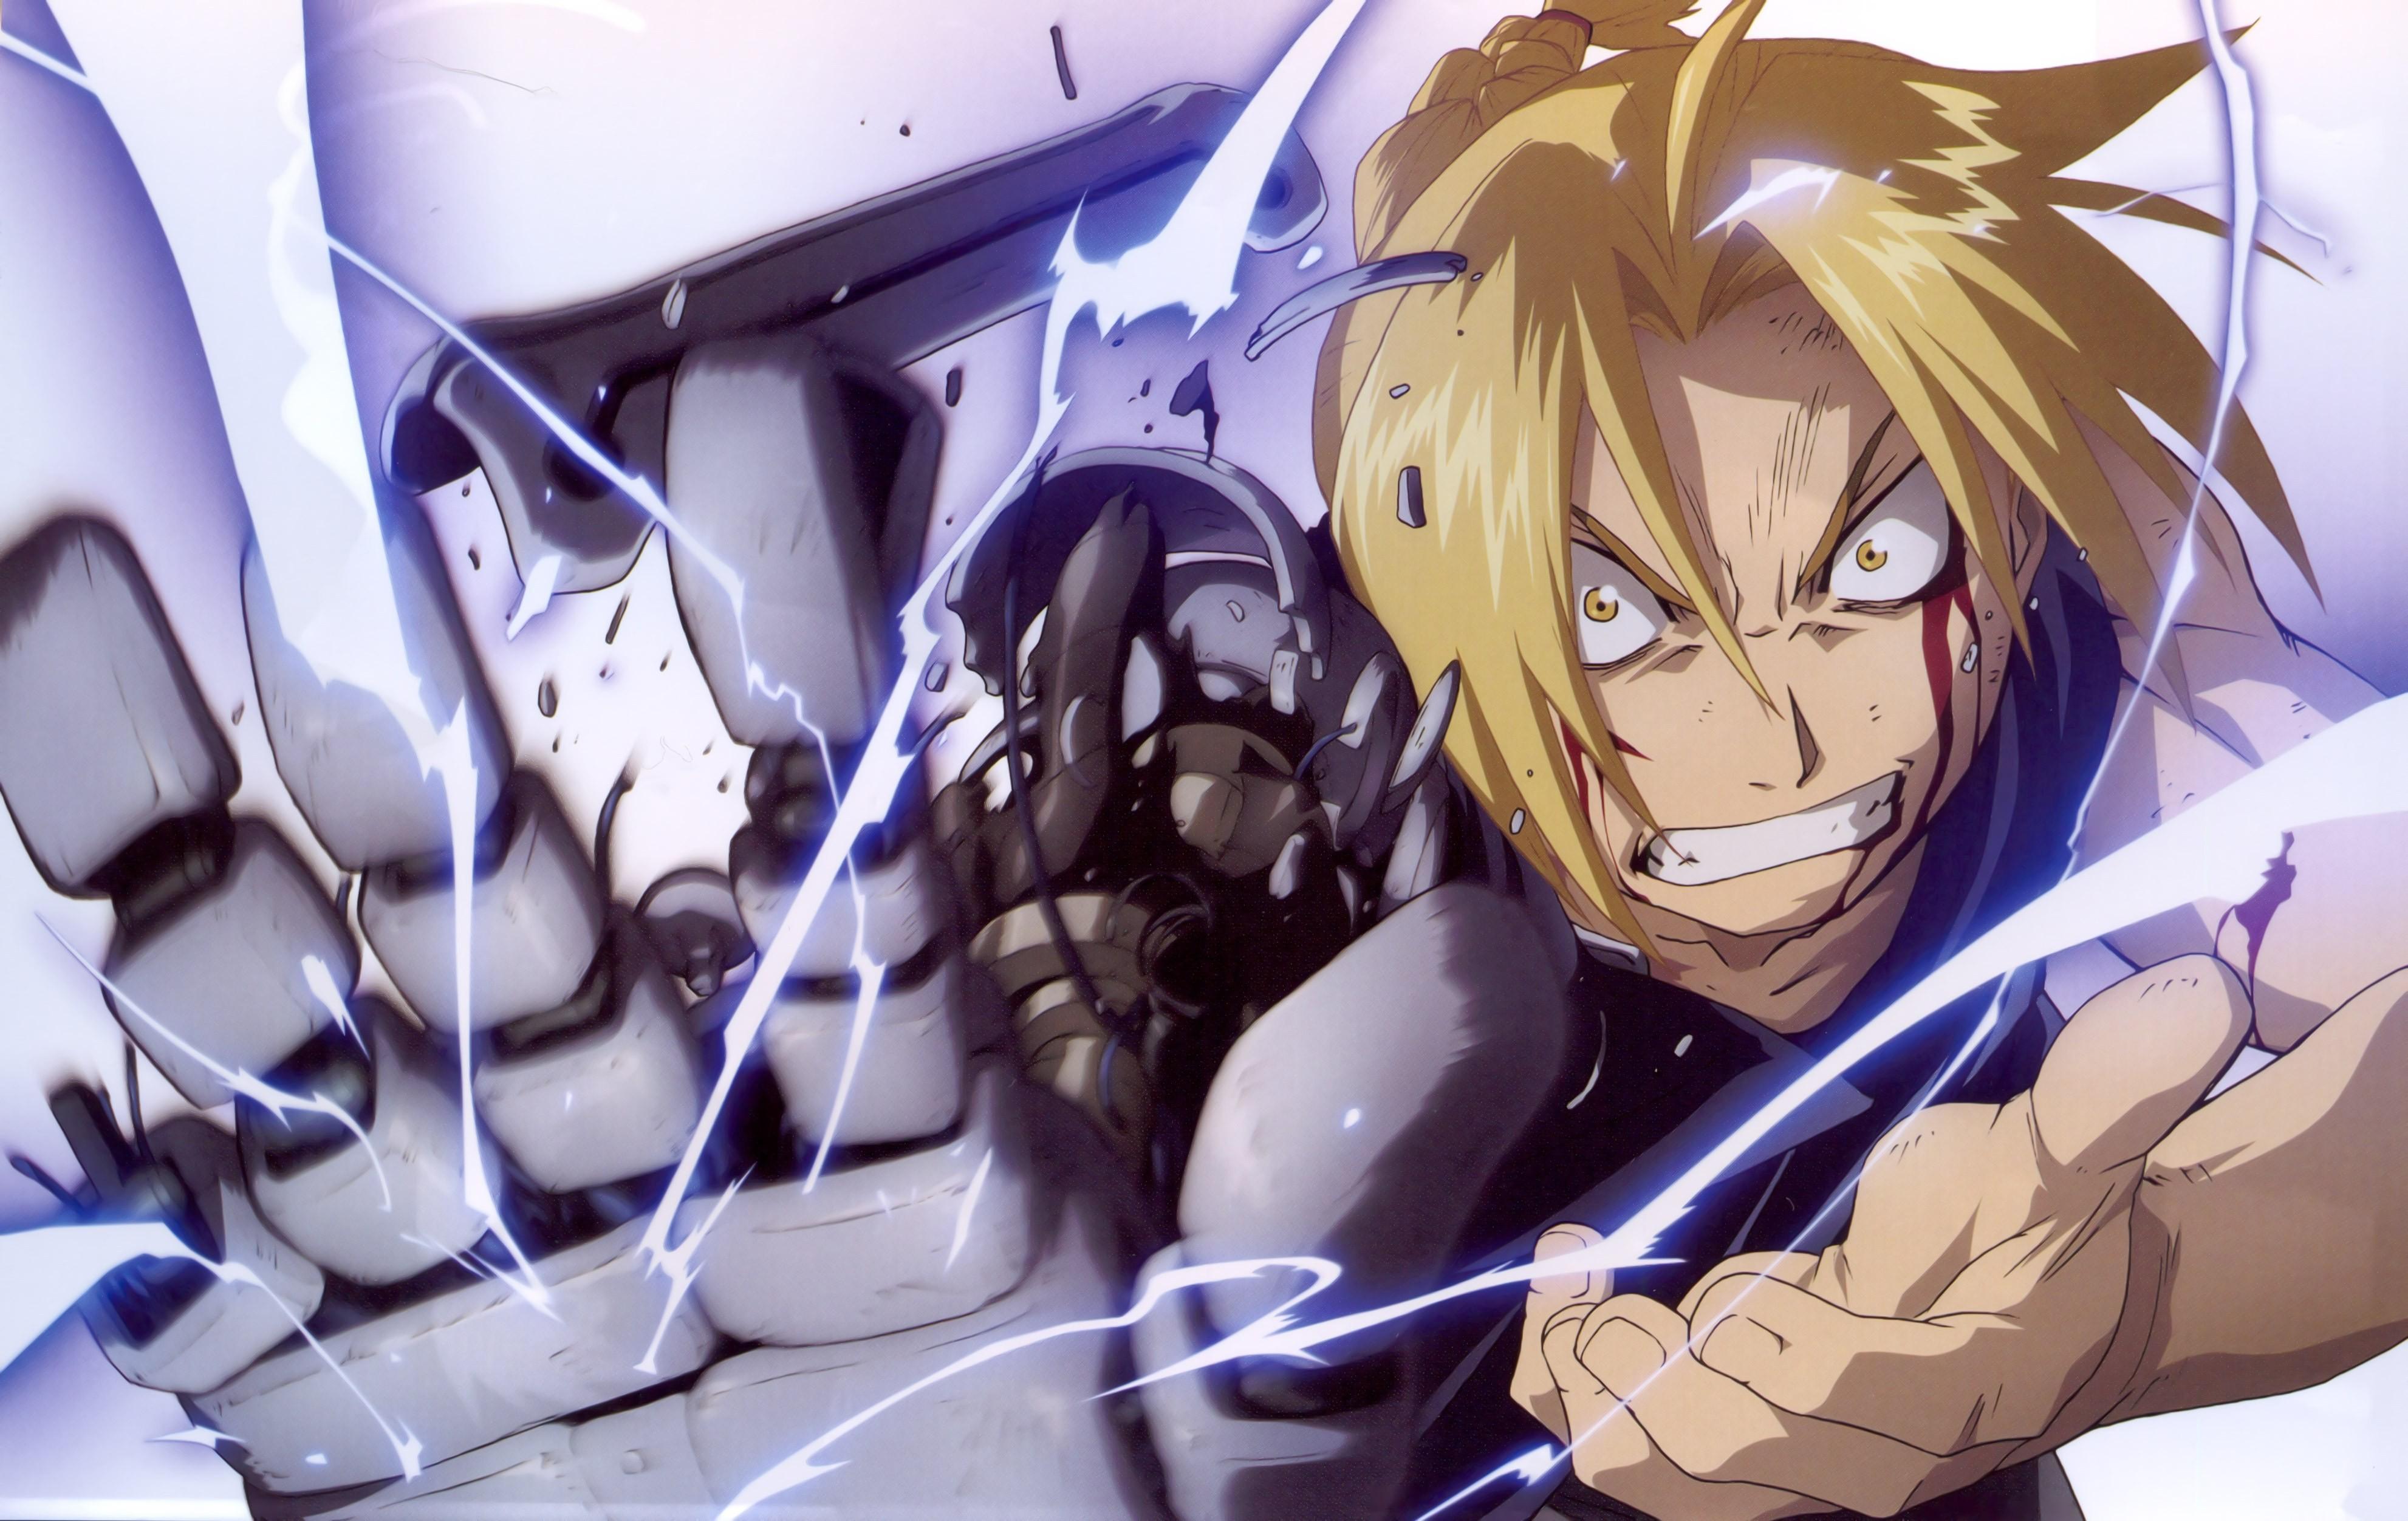 Wallpaper : anime, machine, Elric Edward, Full Metal Alchemist Brotherhood, mecha, mangaka ...